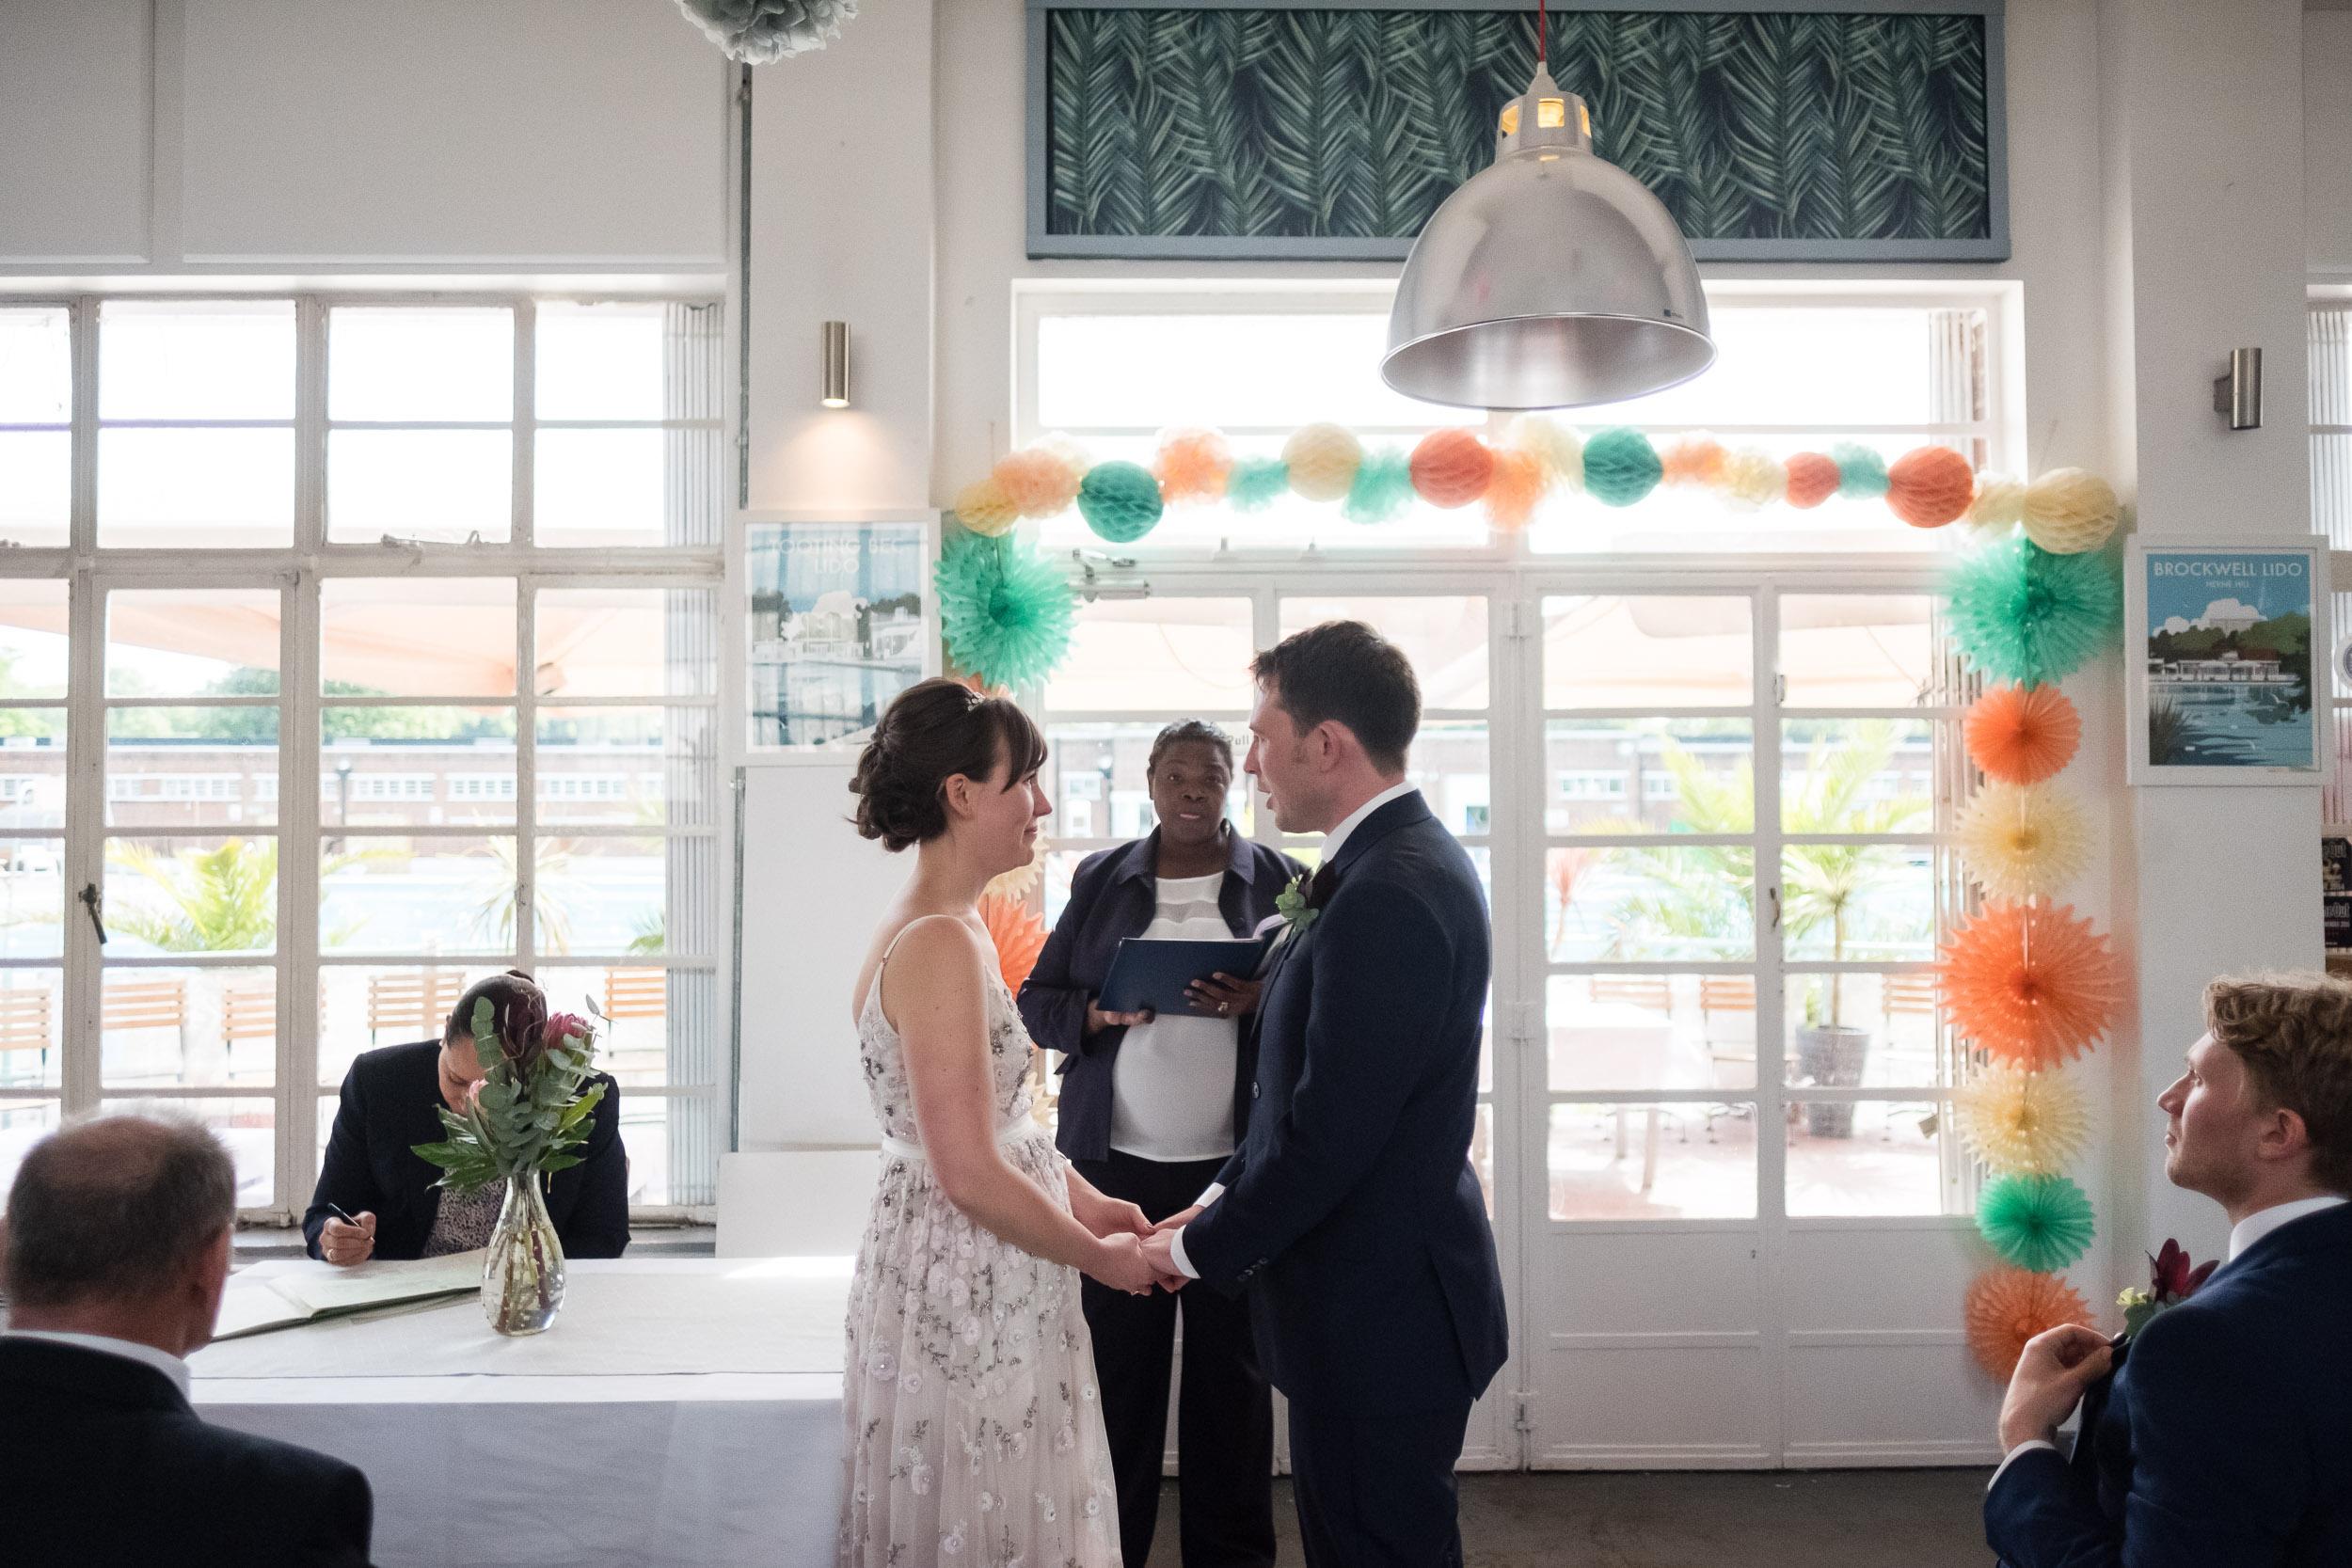 brockwell-lido-brixton-herne-hill-wedding-151.jpg